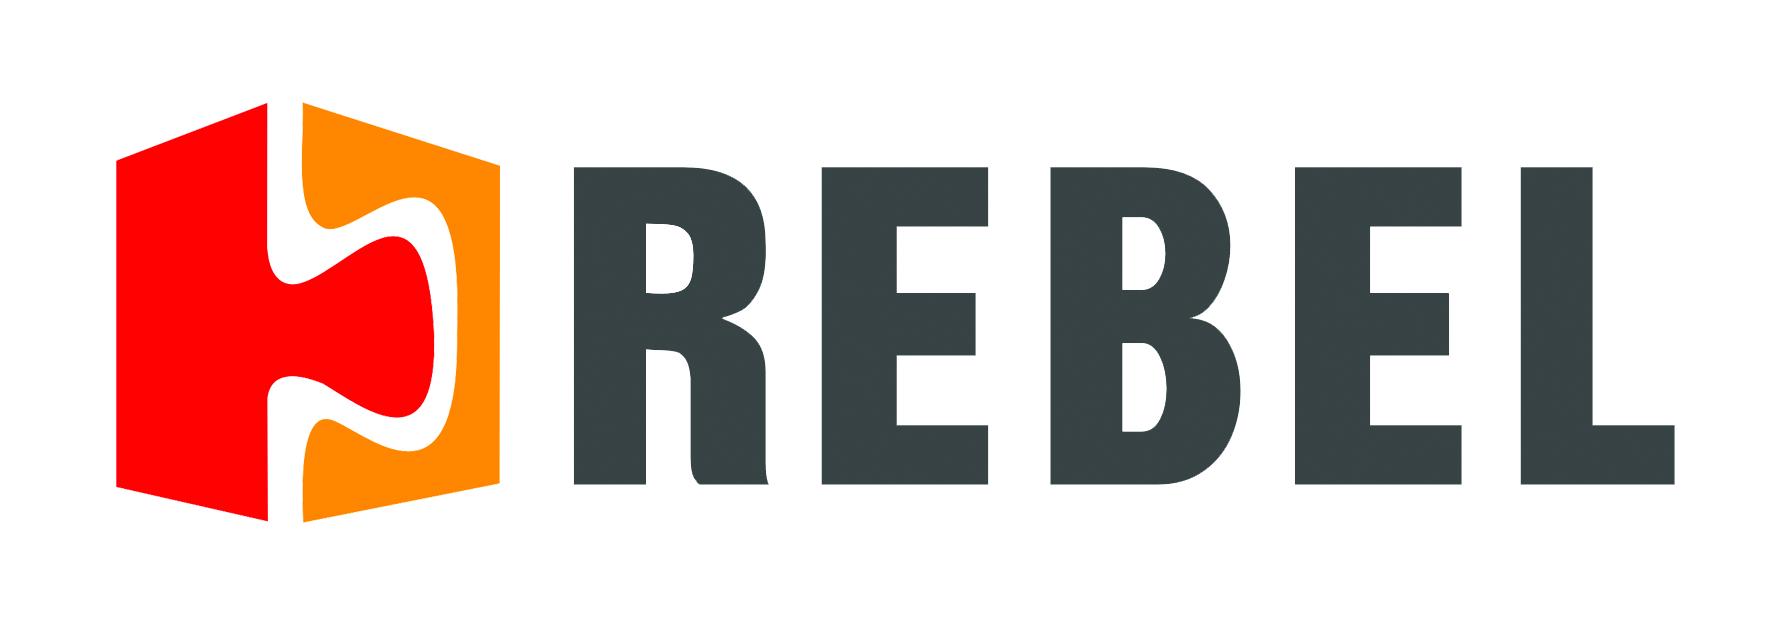 Link do wydawnictwa Rebel.pl